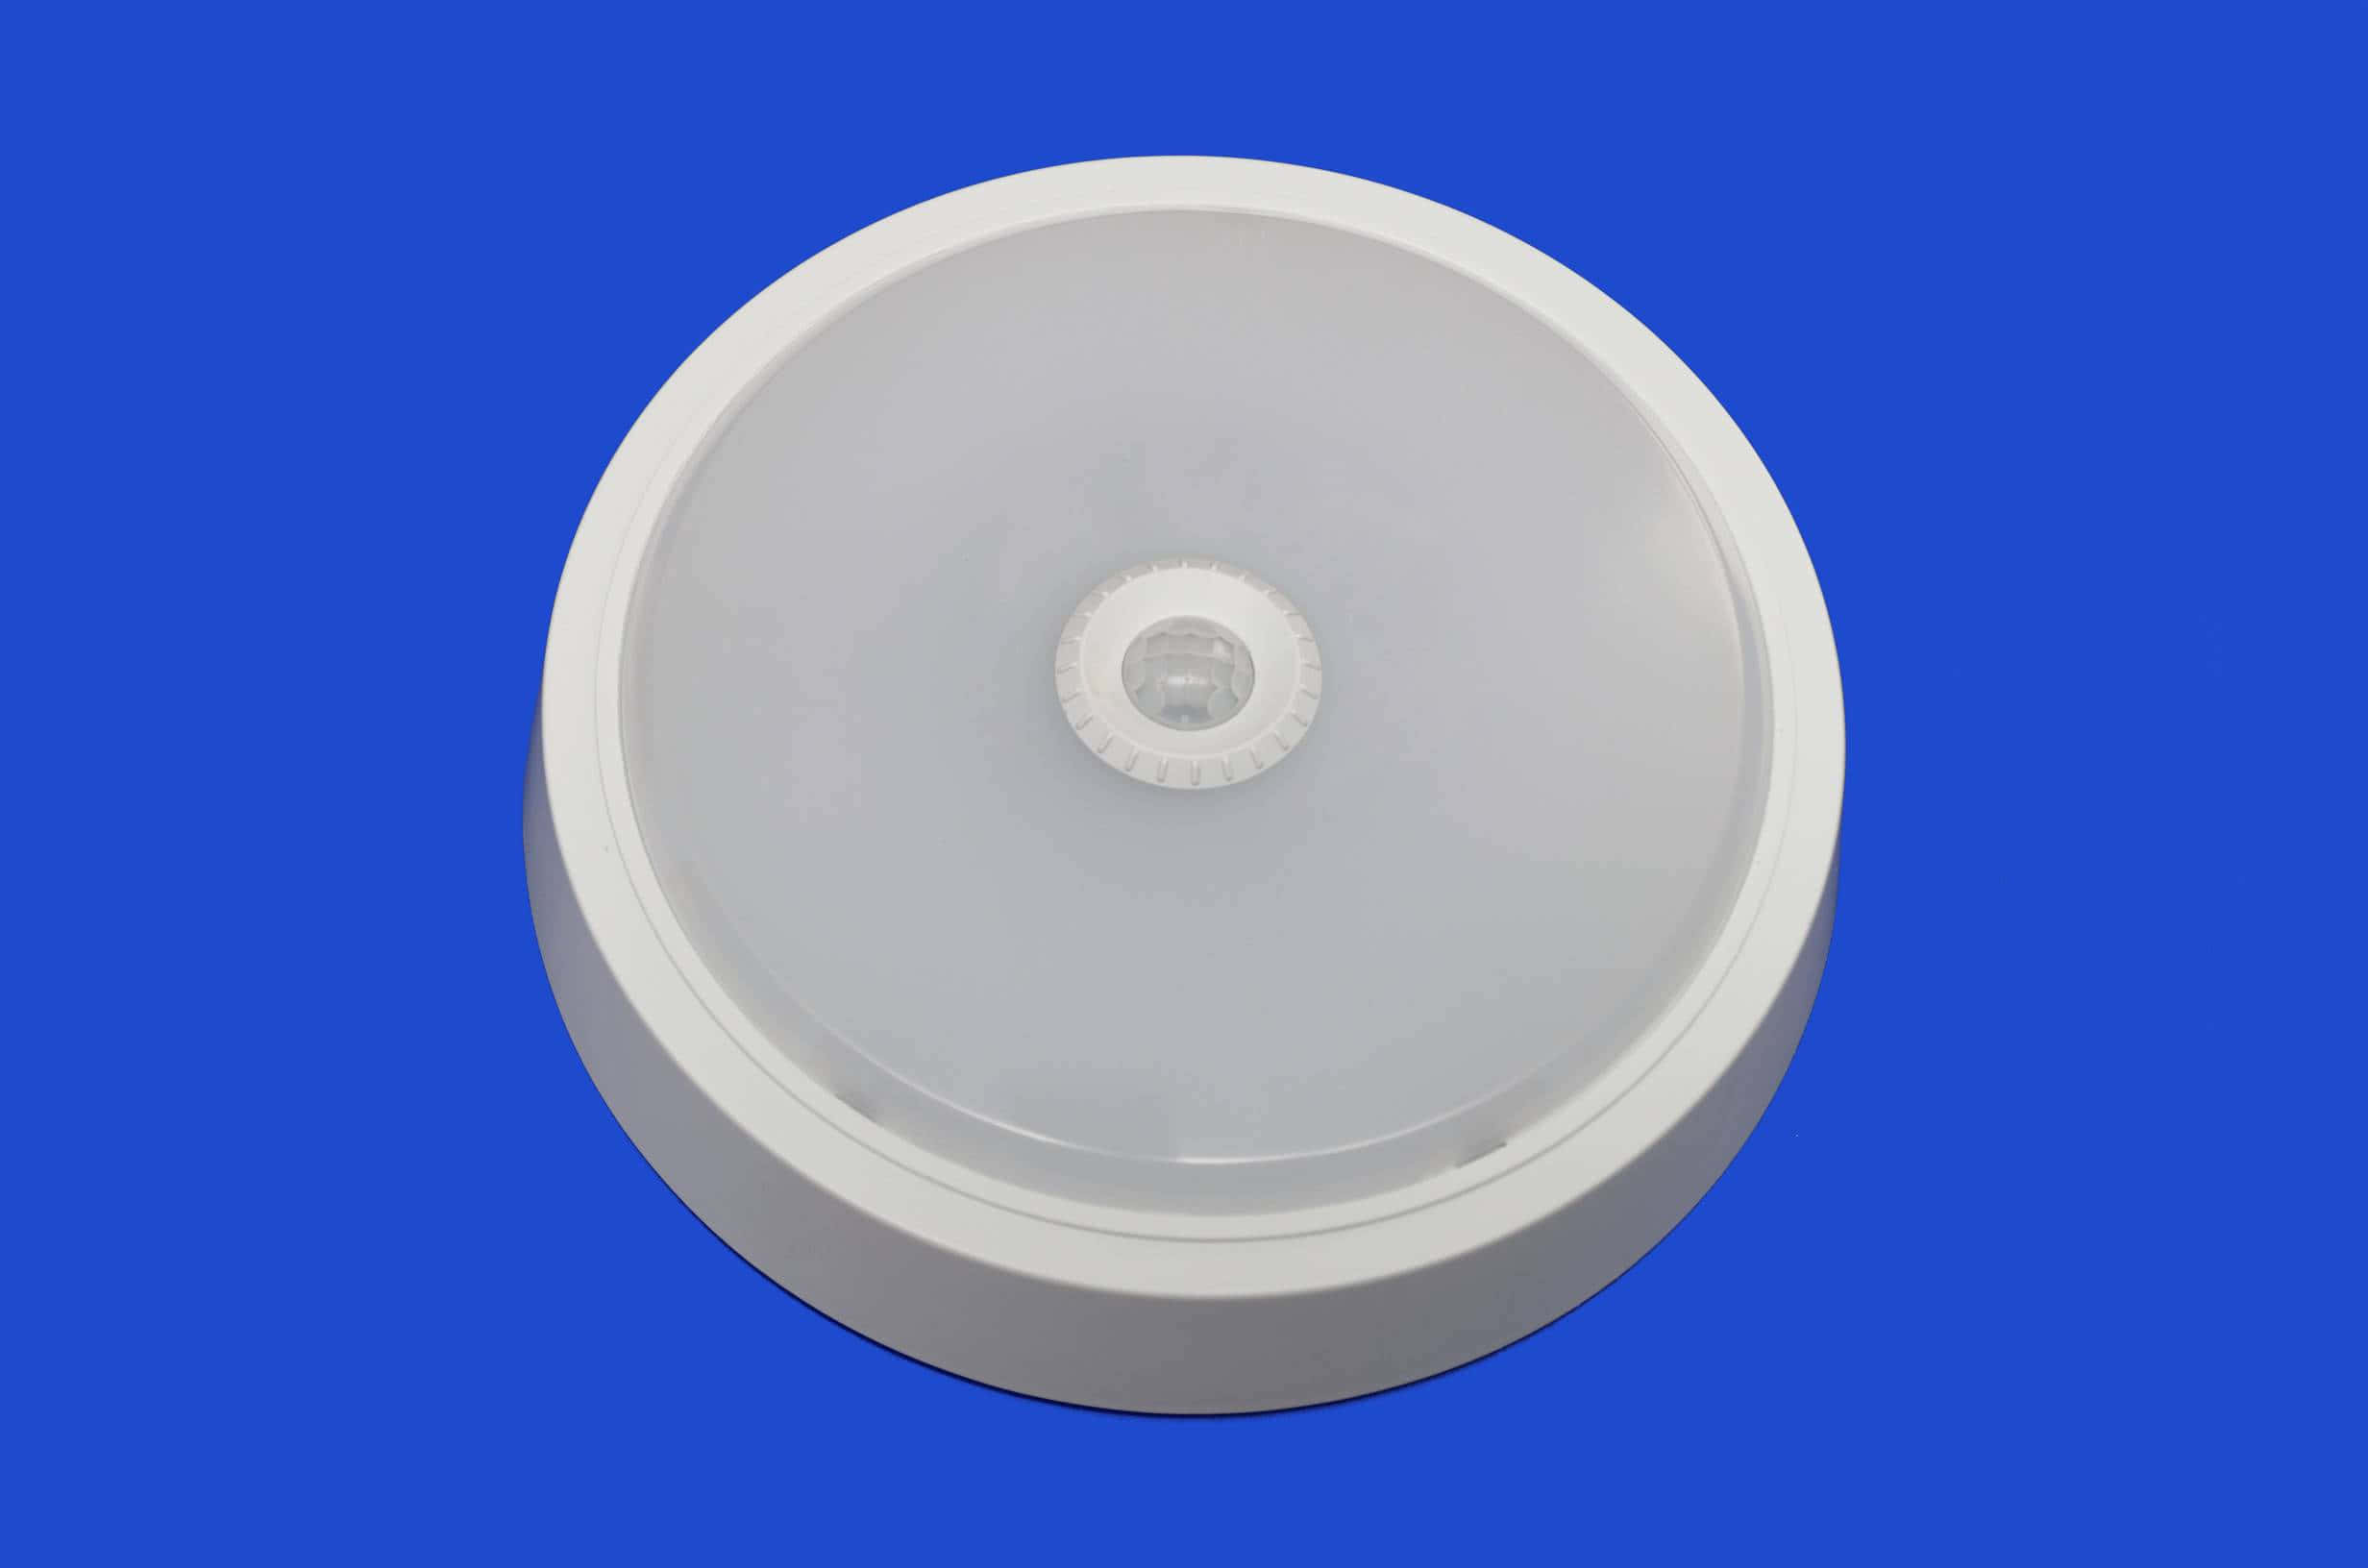 Top Light 10w Lso 10w Nw Pir Lampa Sufitowa Led